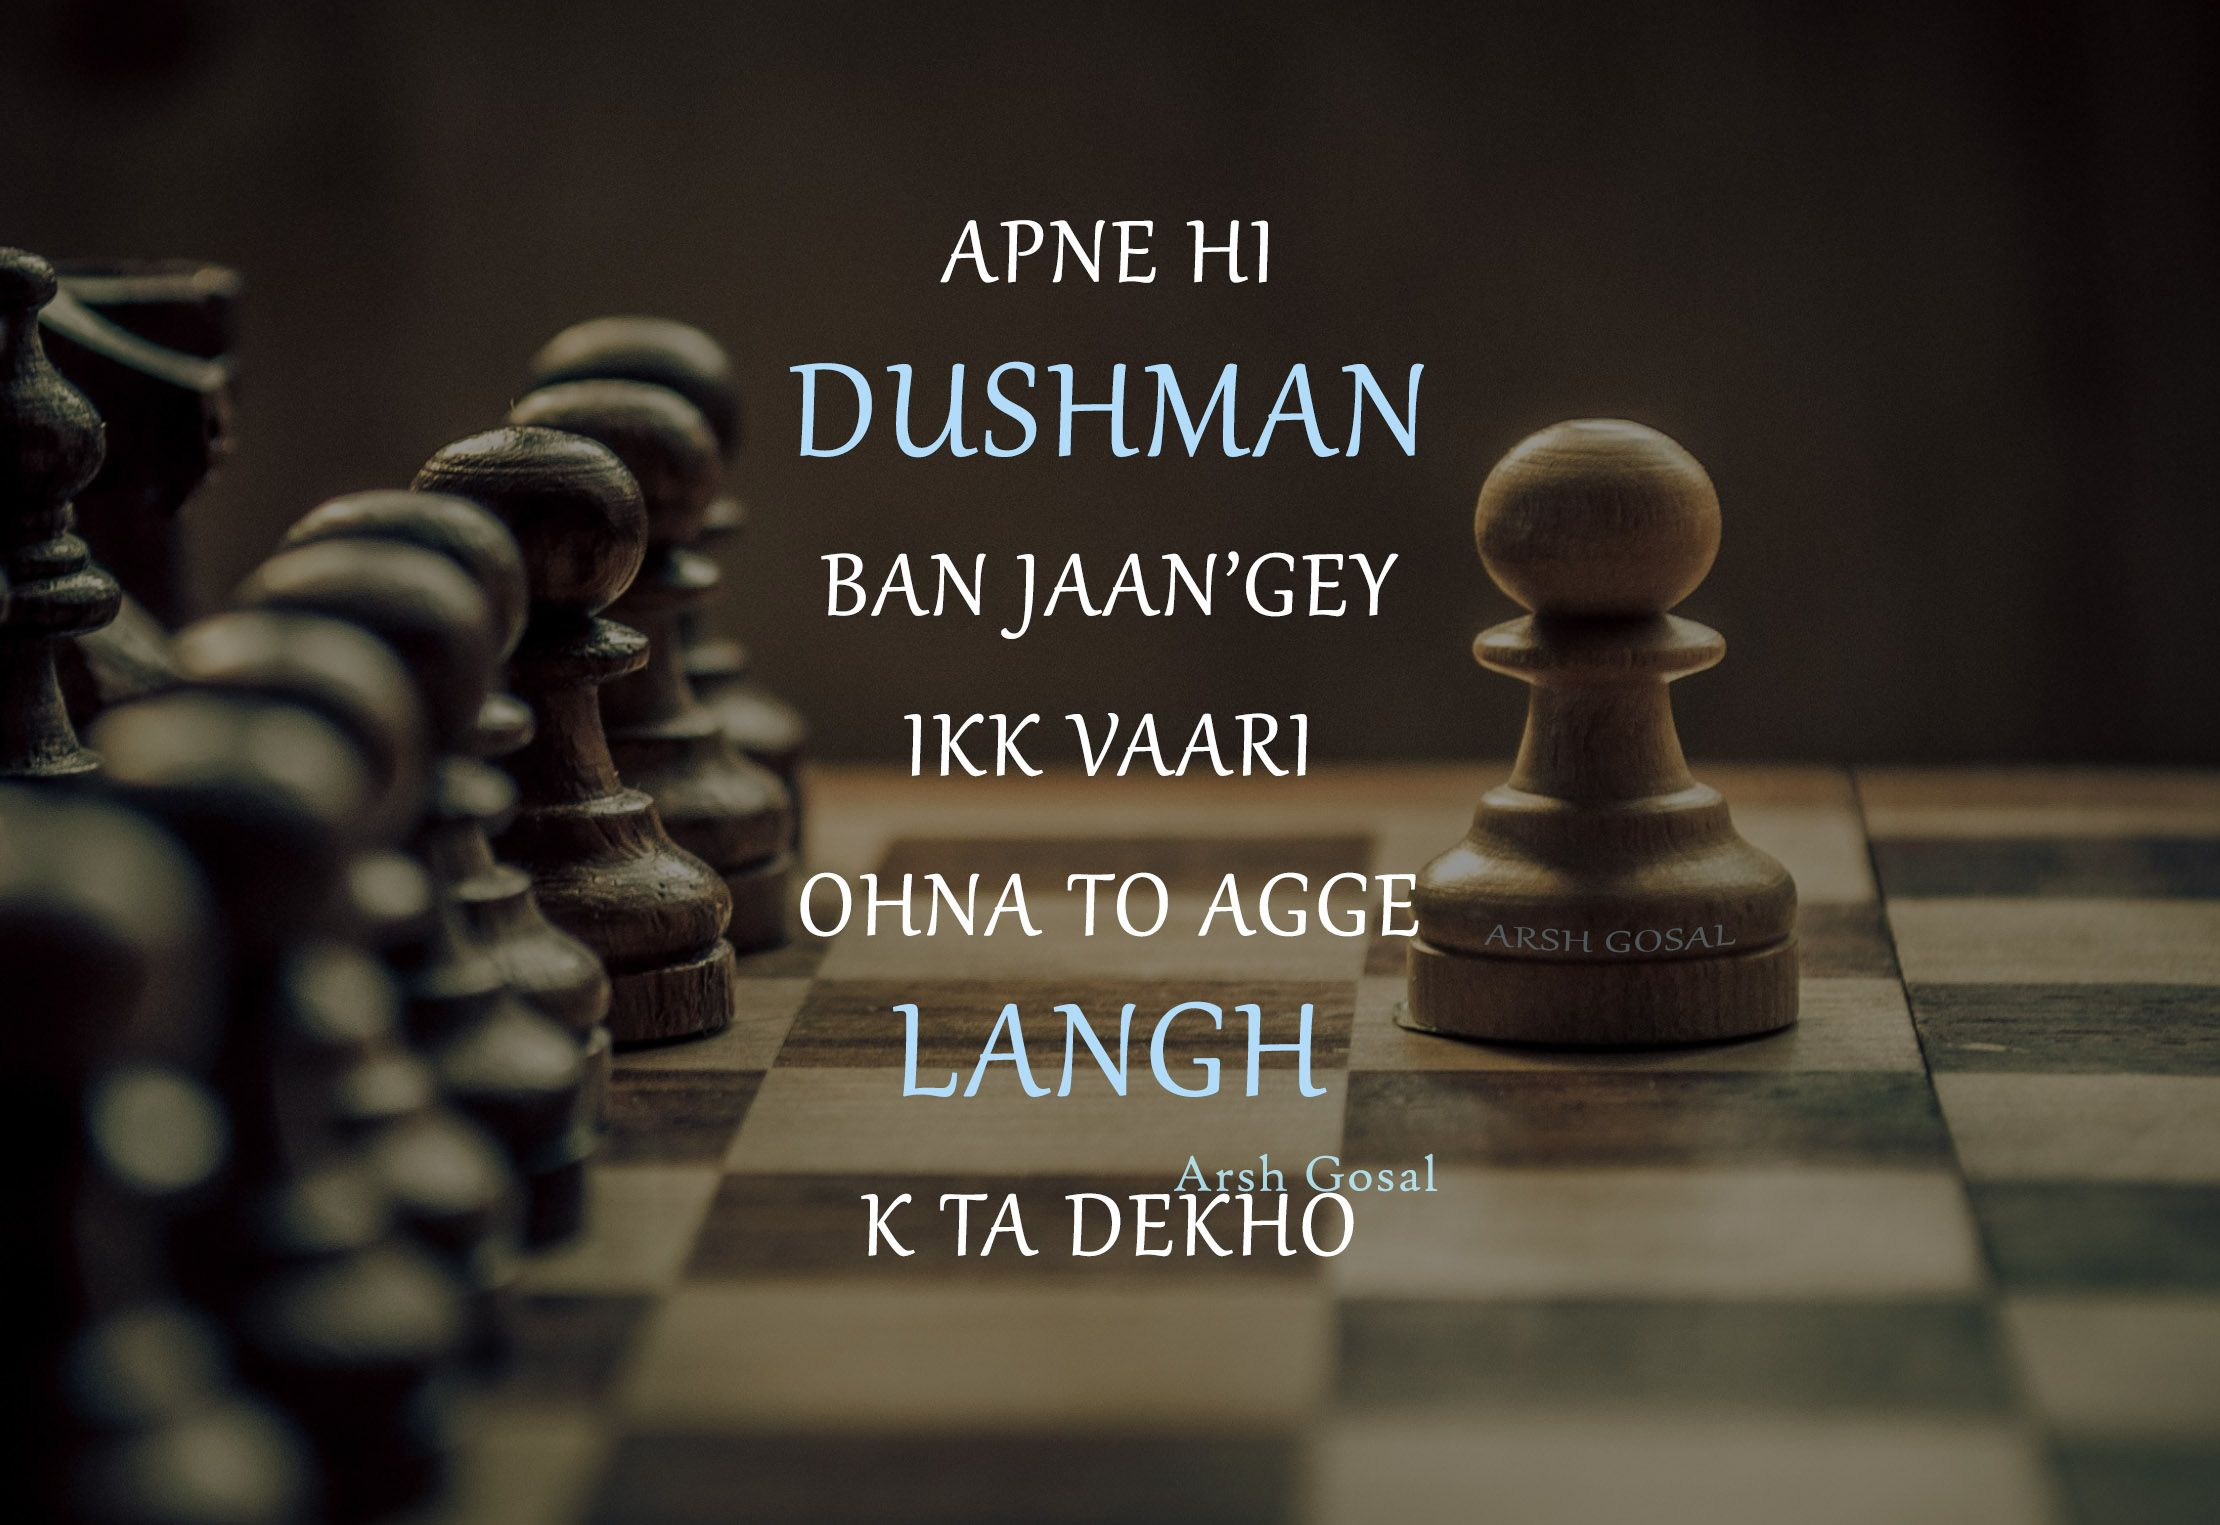 Apne Hi Dushman Ban Gaye Punjabi Quote Dunia Matlabi Wording Arsh Gosal Punjabi Quotes Quotes Words